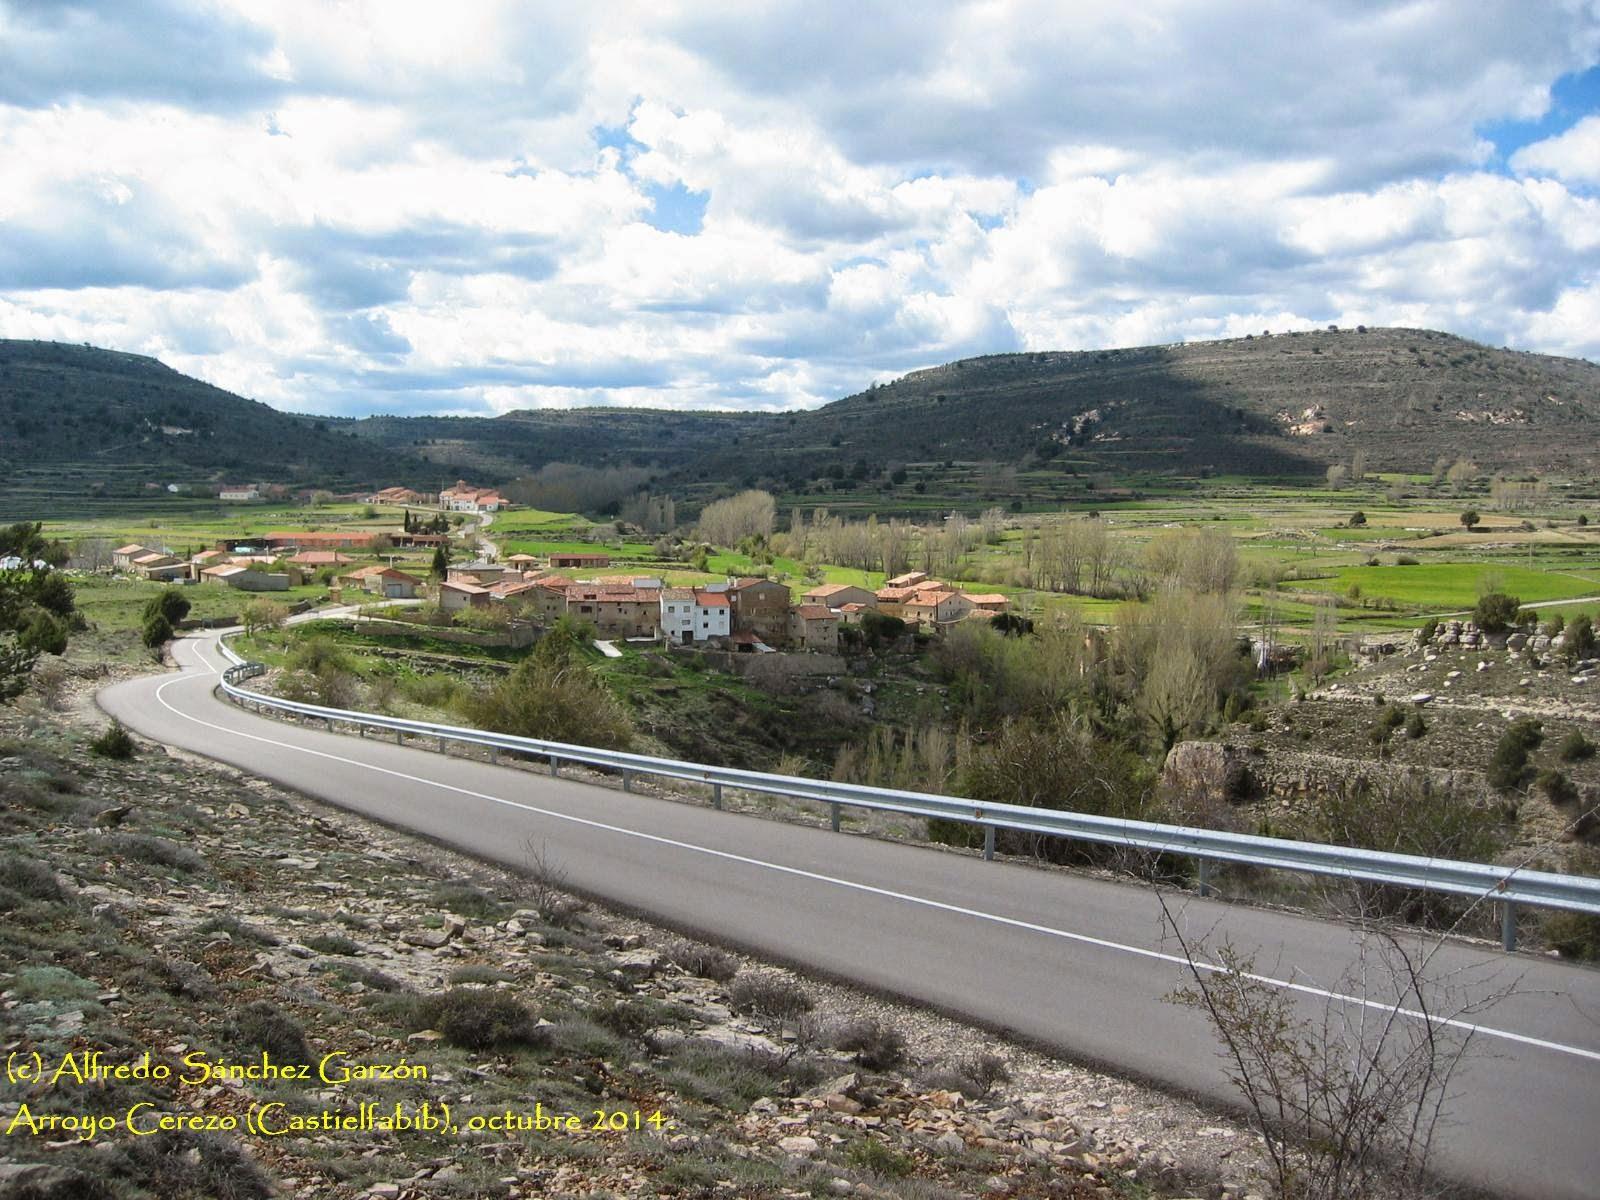 arroyo-cerezo-castielfabib-muela-carretera